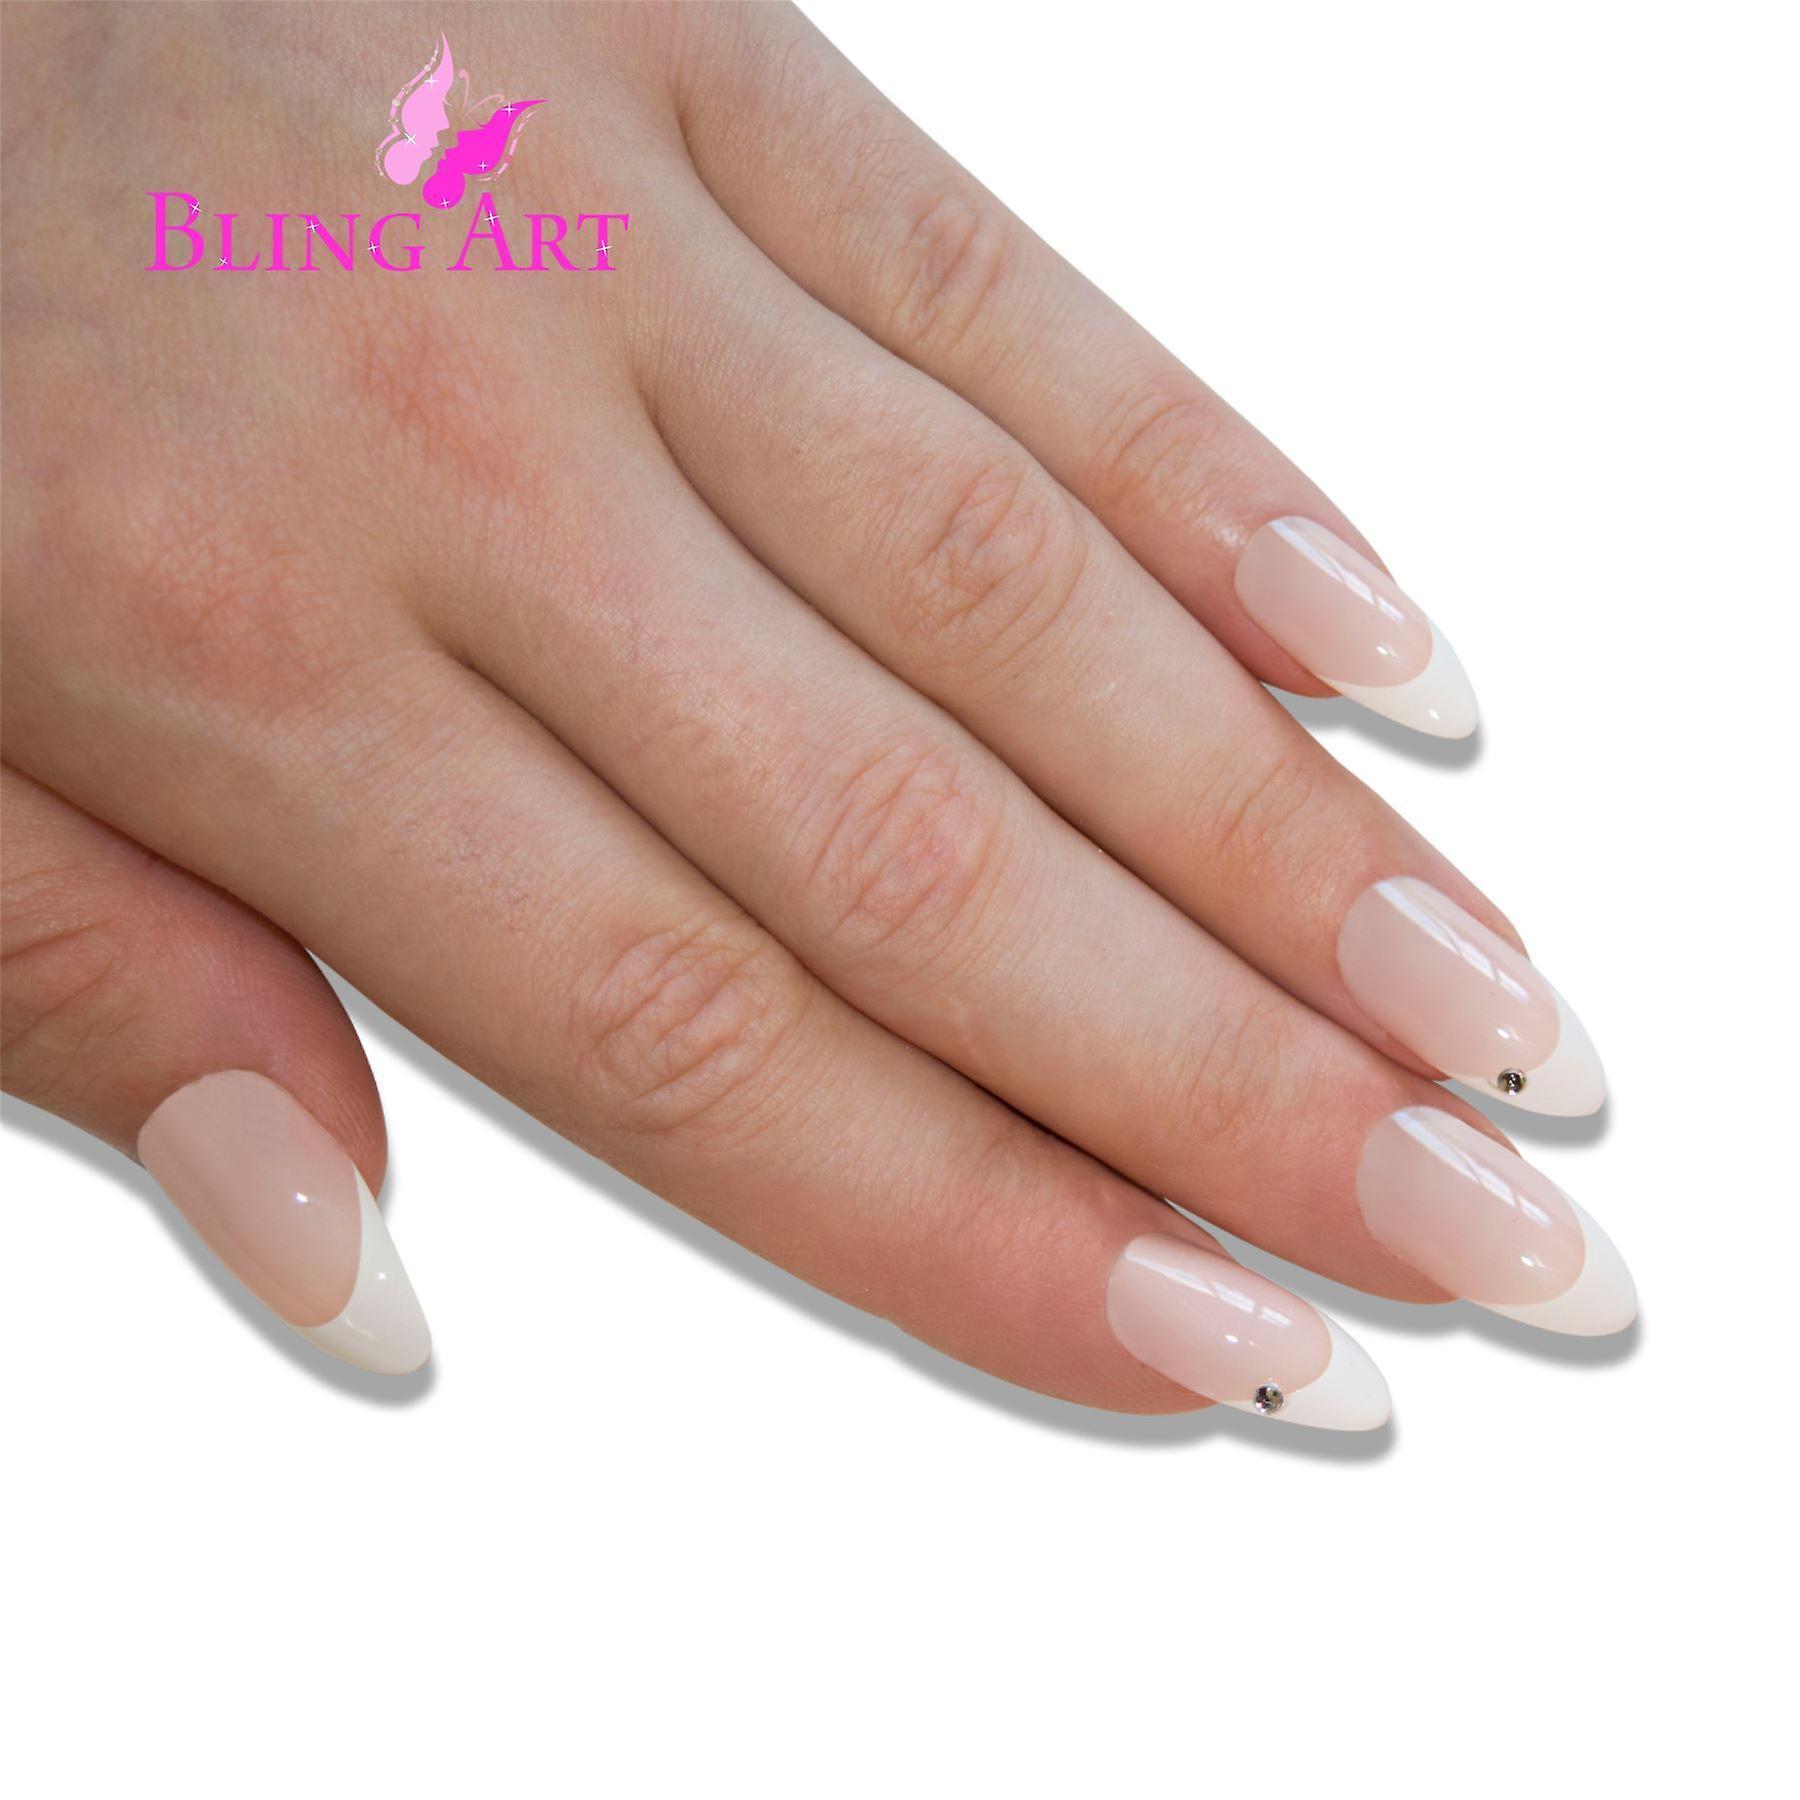 False nails bling art white crystal almond stiletto long fake acrylic tips glue